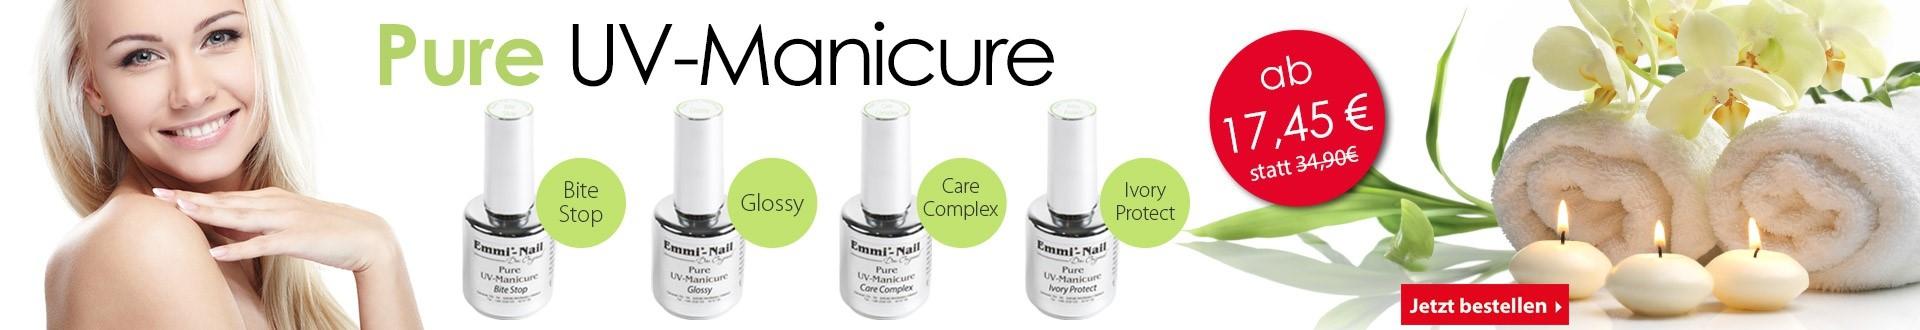 Pure UV-Manicure